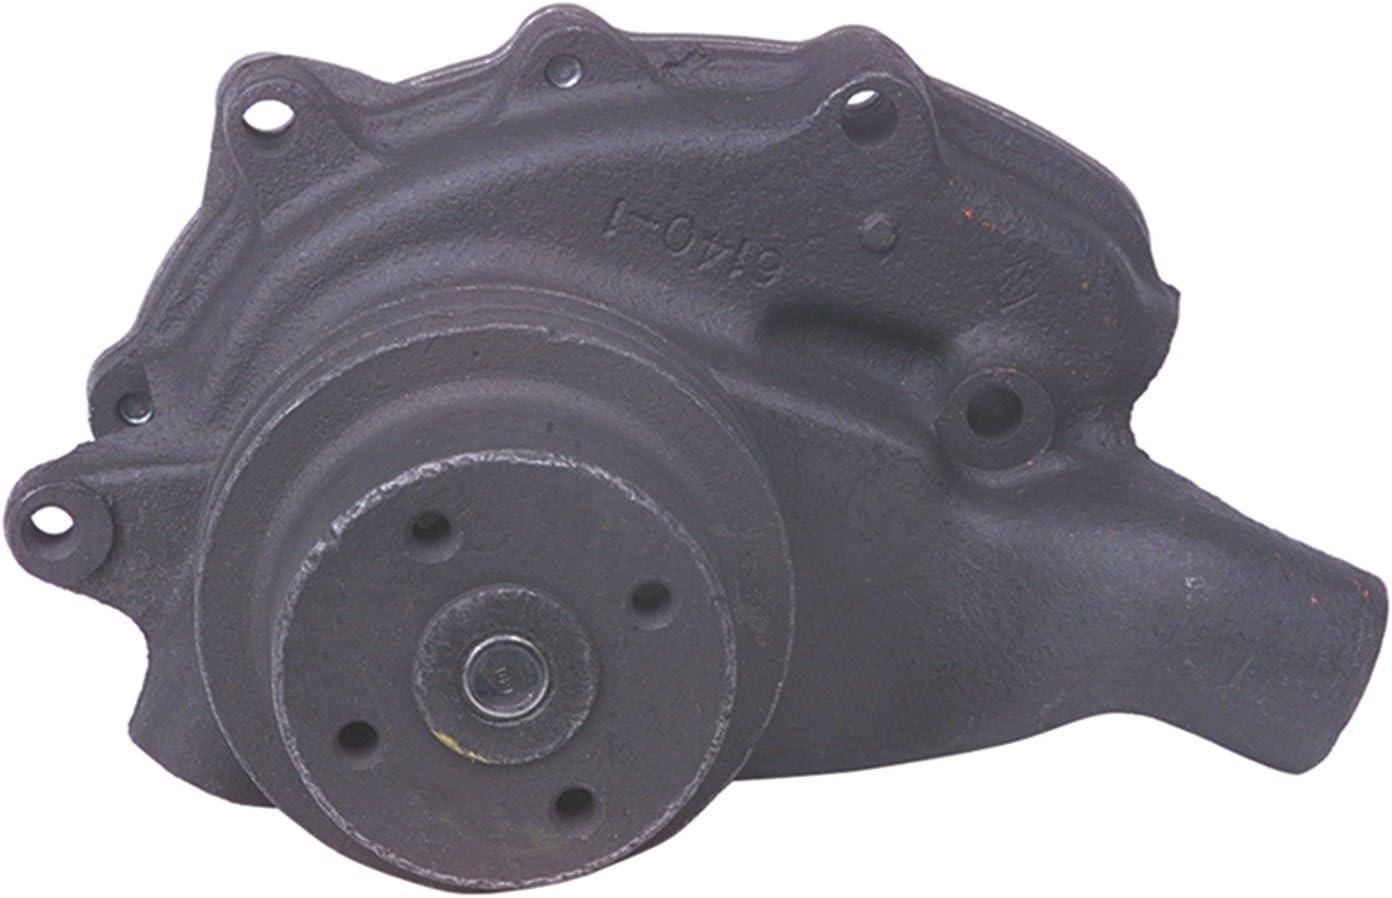 Cardone 59-8015 Remanufactured Heavy Duty Water Pump